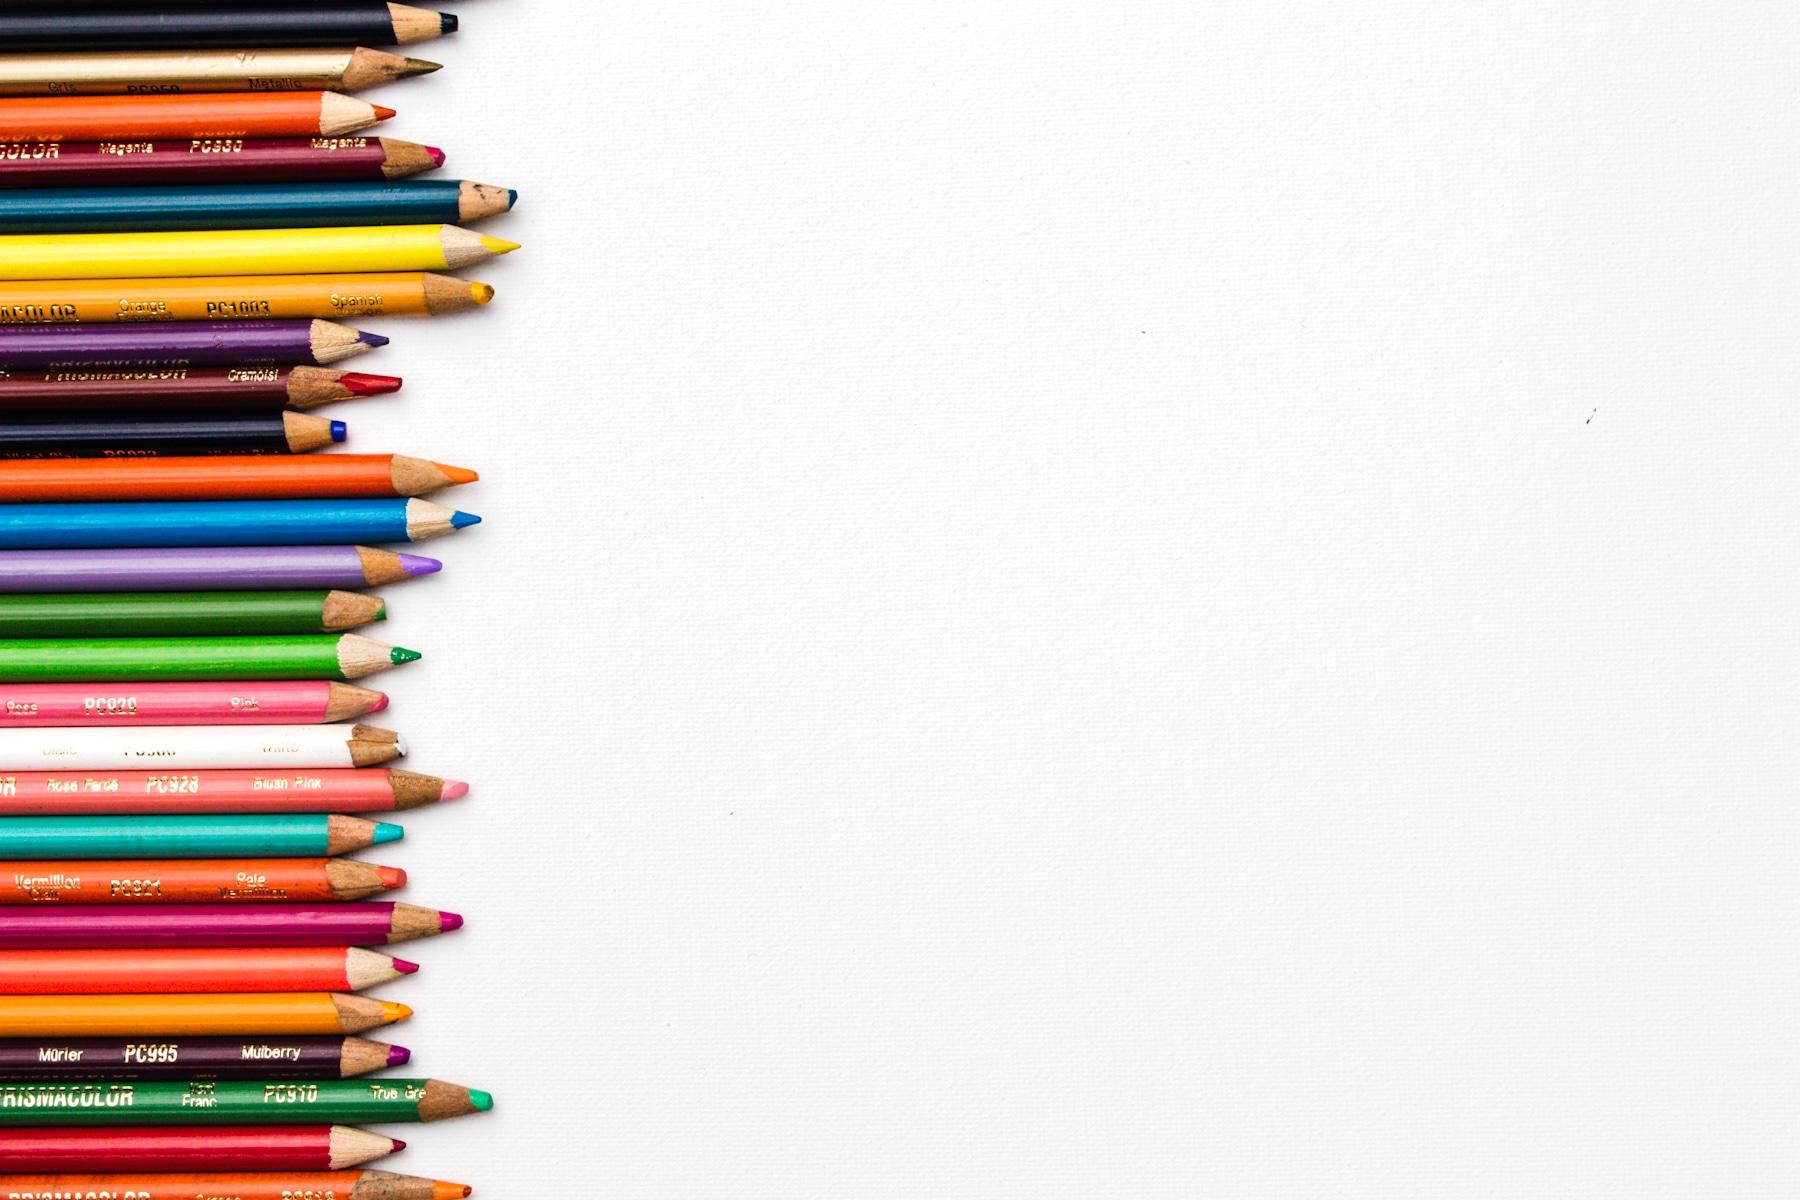 decorative image of colored pencils